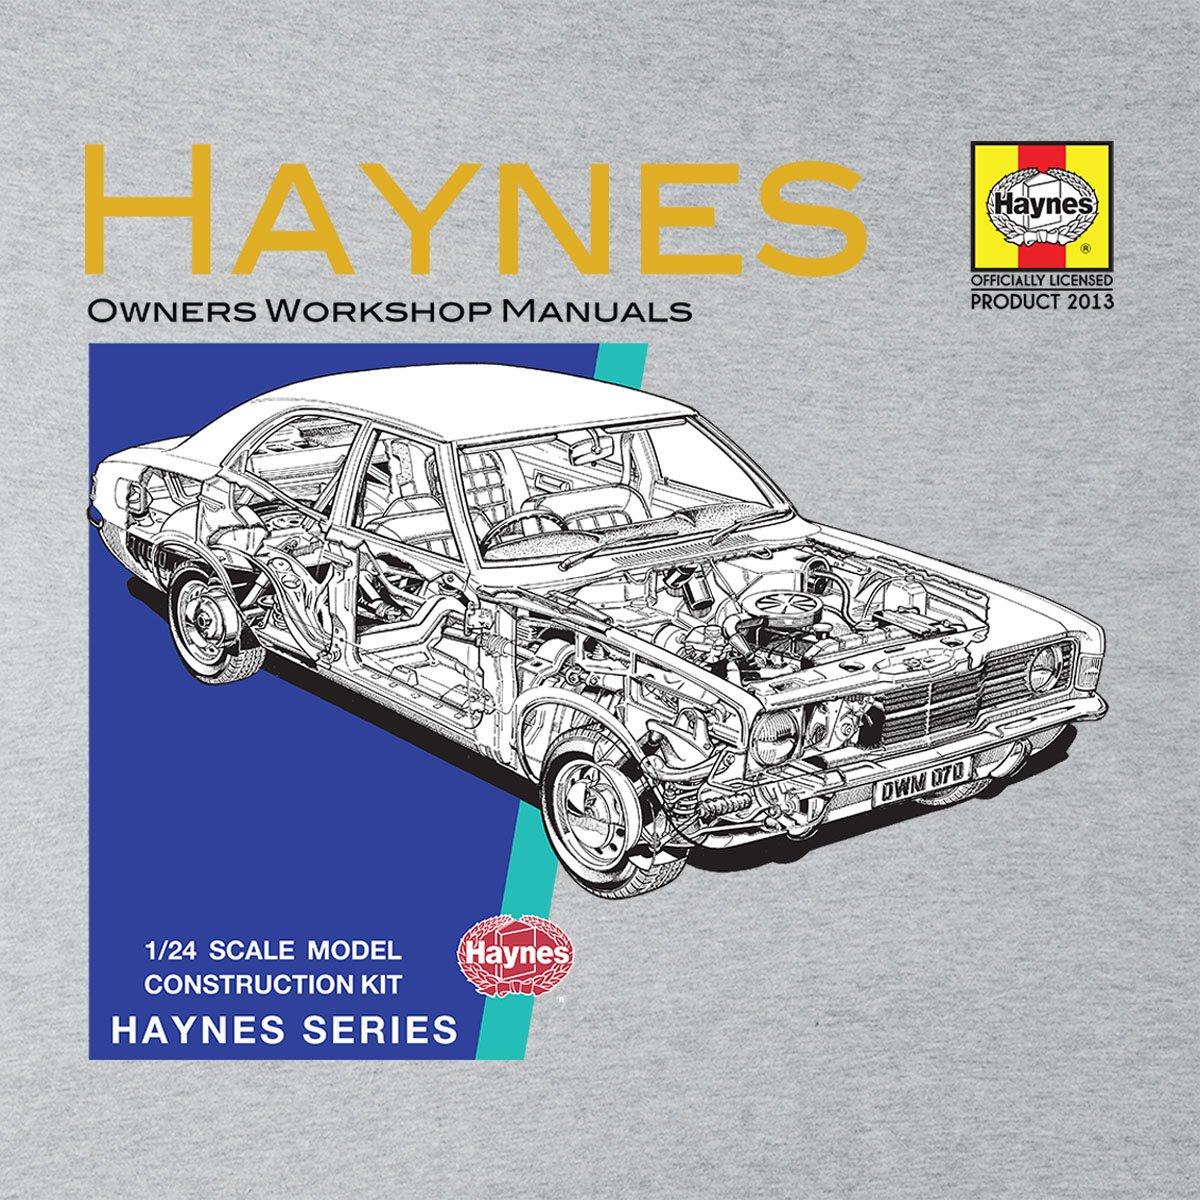 amazon com pod66 haynes owners workshop manual 0070 ford cortina rh amazon com Cortina Mk2 Ford Cortina MK